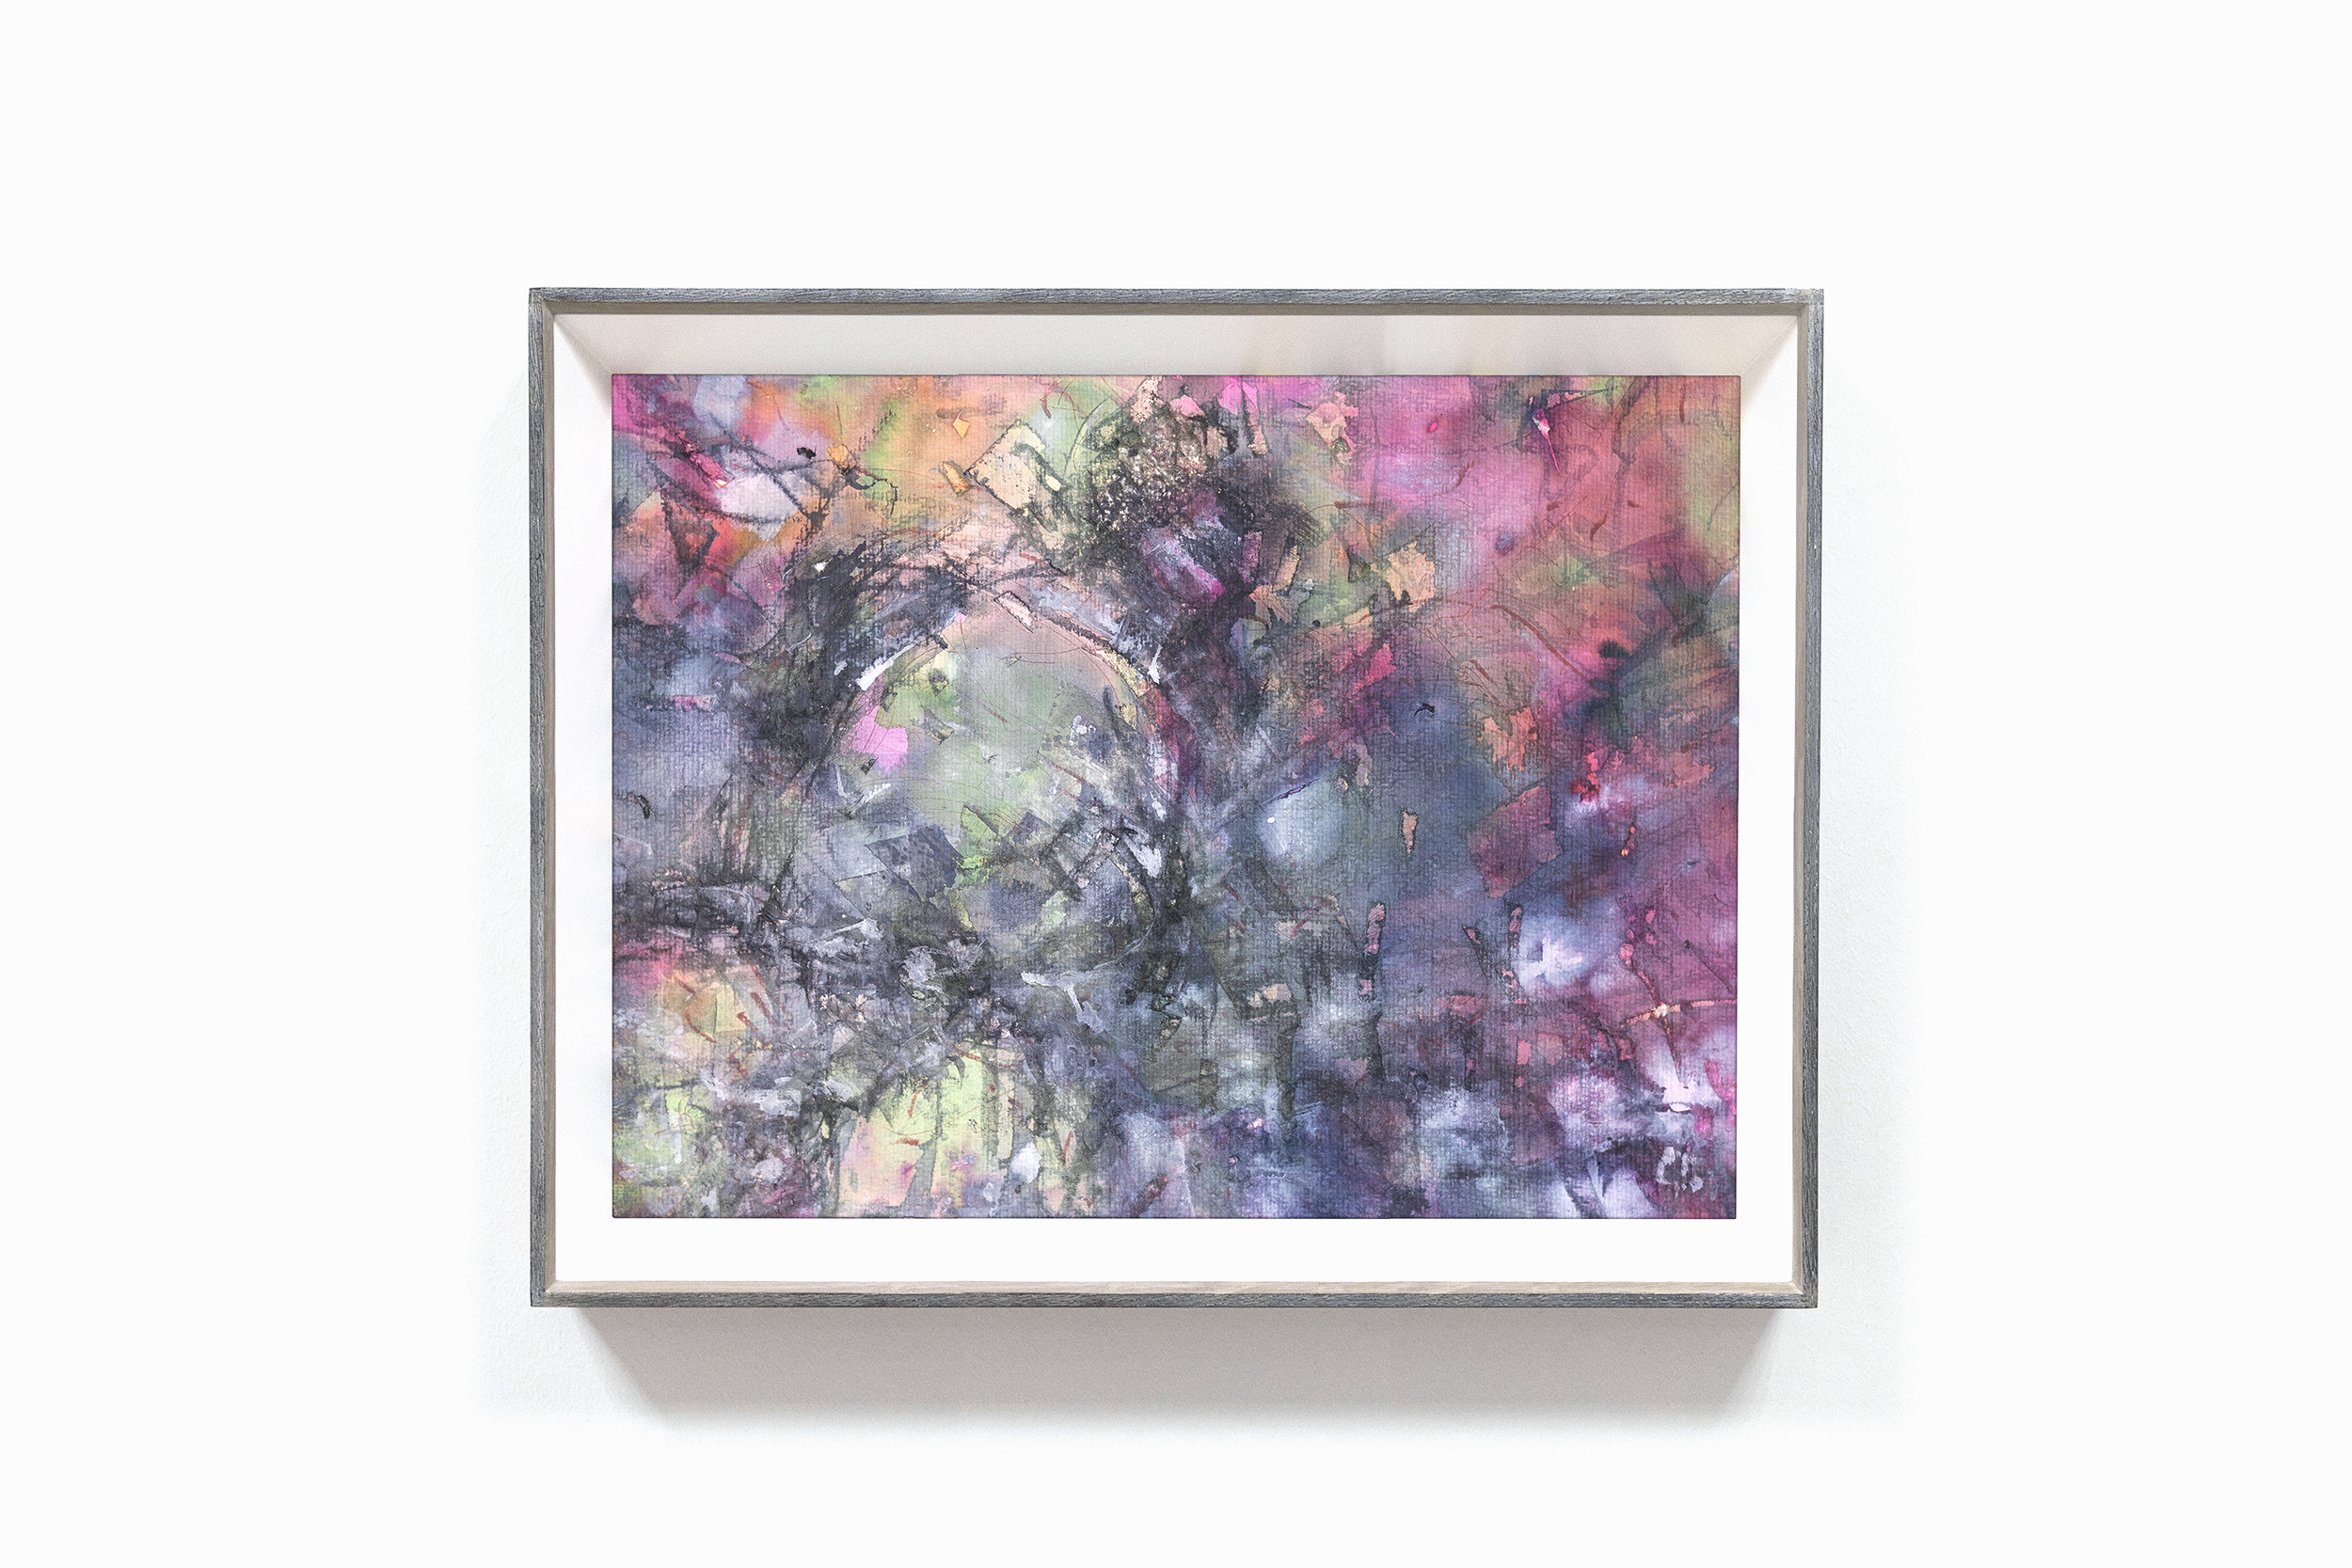 bonjourmolotov+Legacy+Illustration+Ilustracao+painting+pintura+acrylic+acrílico+canvas+tela+paper+cardboard+mdf+Andre+Gigante.jpg